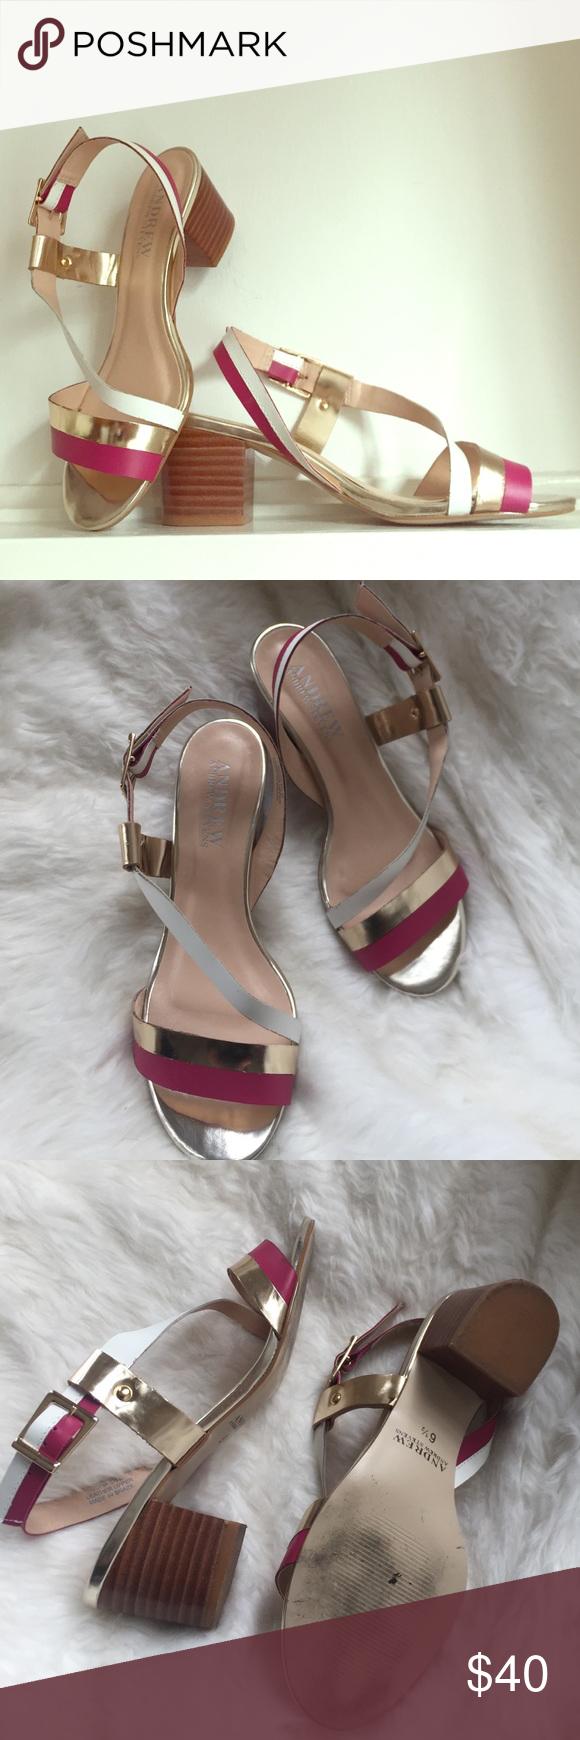 6cc58704f1f390 Andrew Stevens Sofia Metallic Leather Sandals